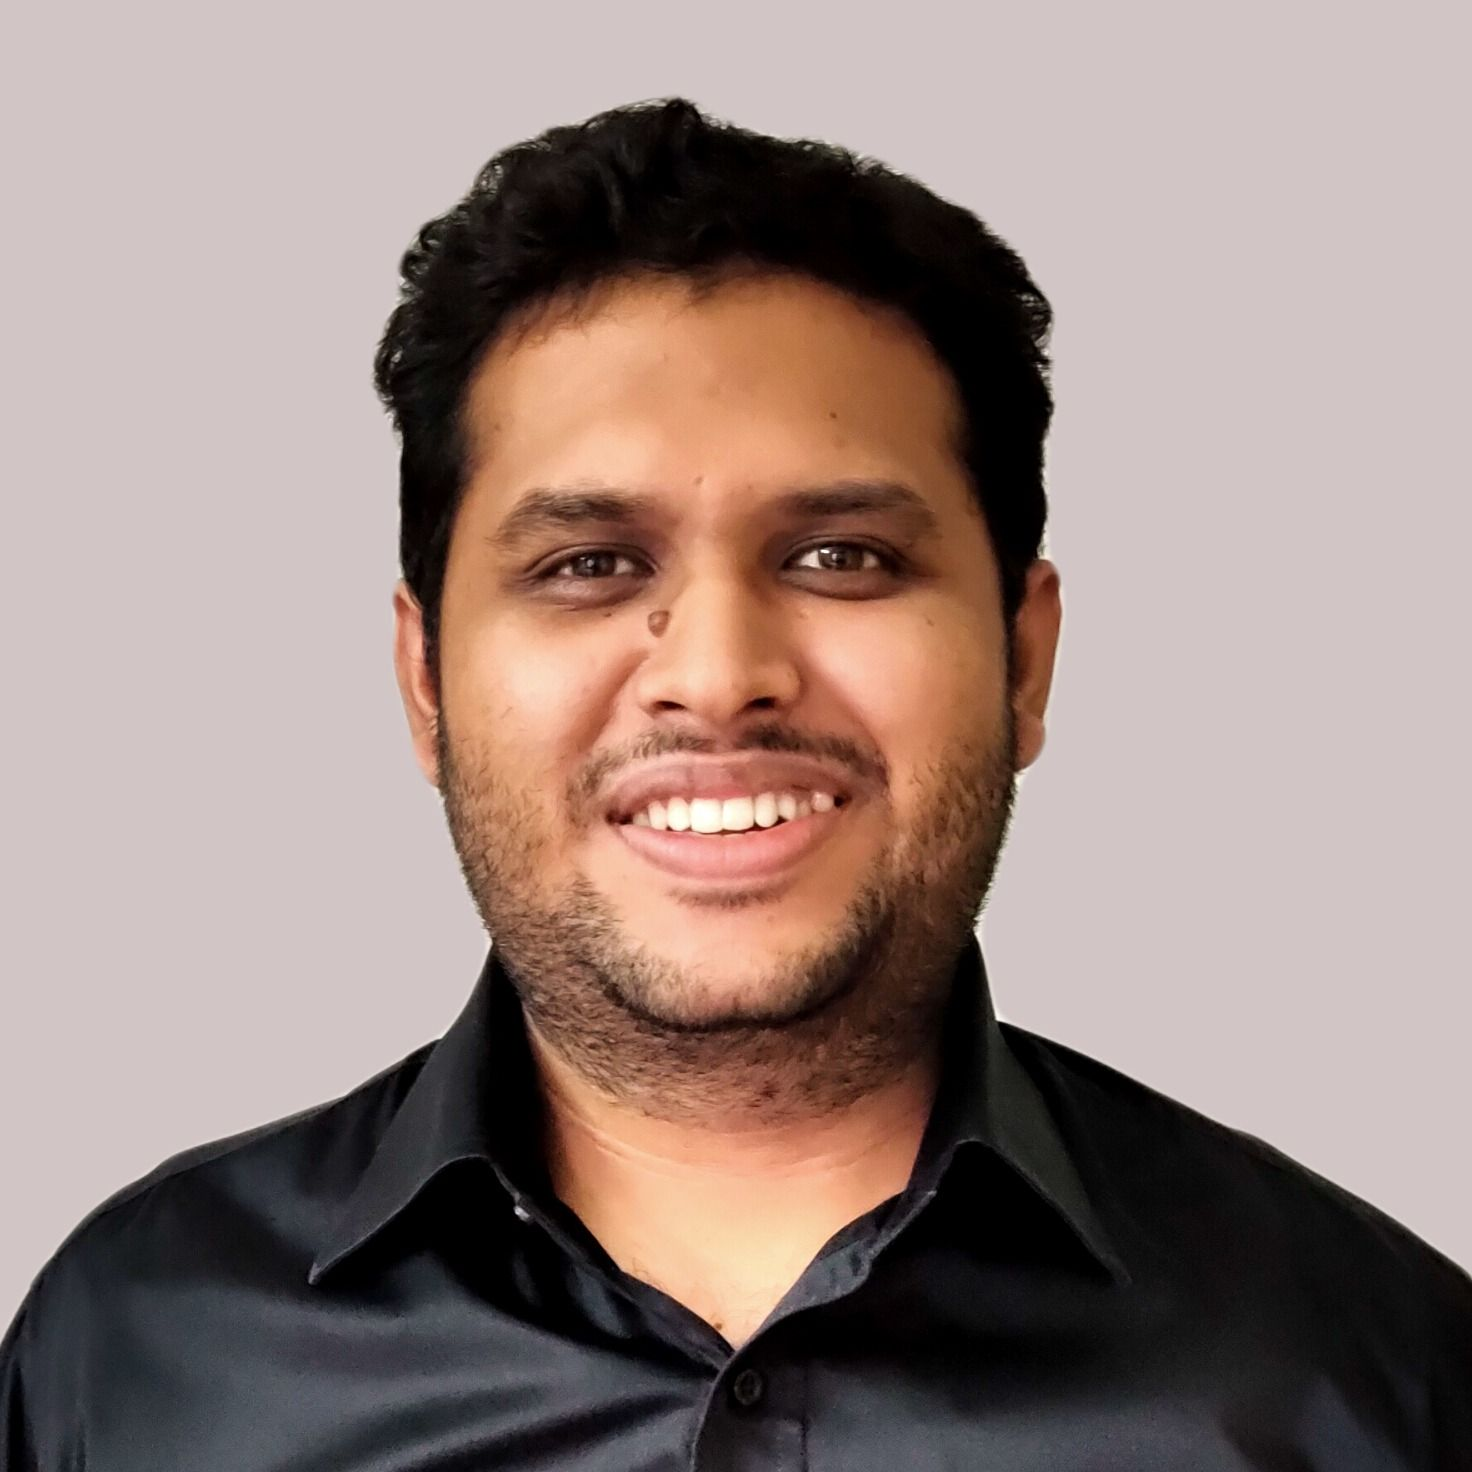 Ershadul Hakim Rayhan Hacker Noon profile picture